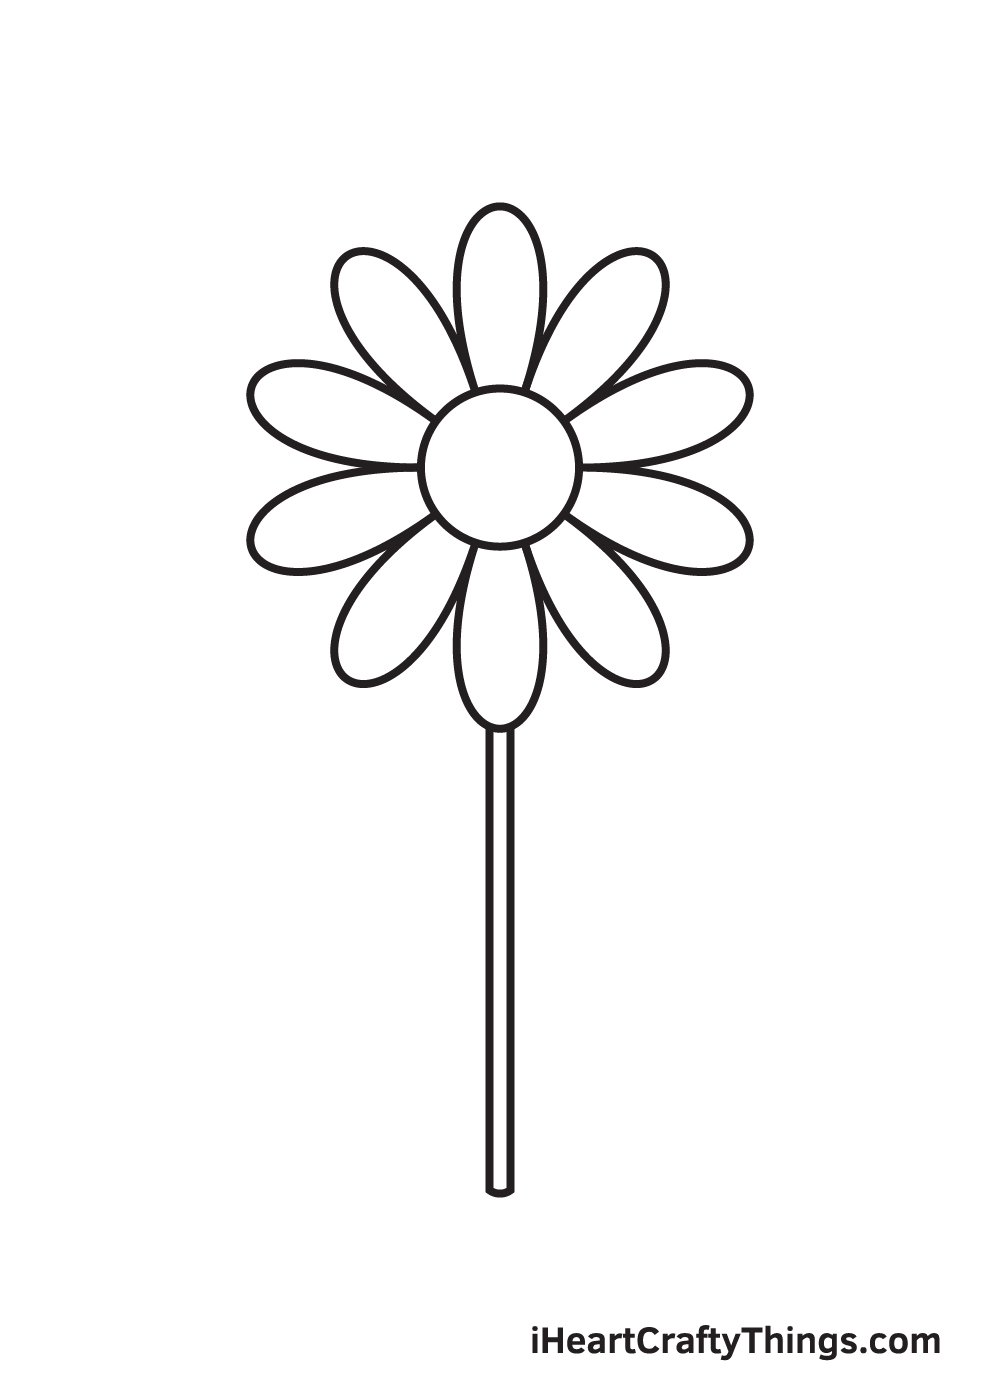 daisy drawing - step 5